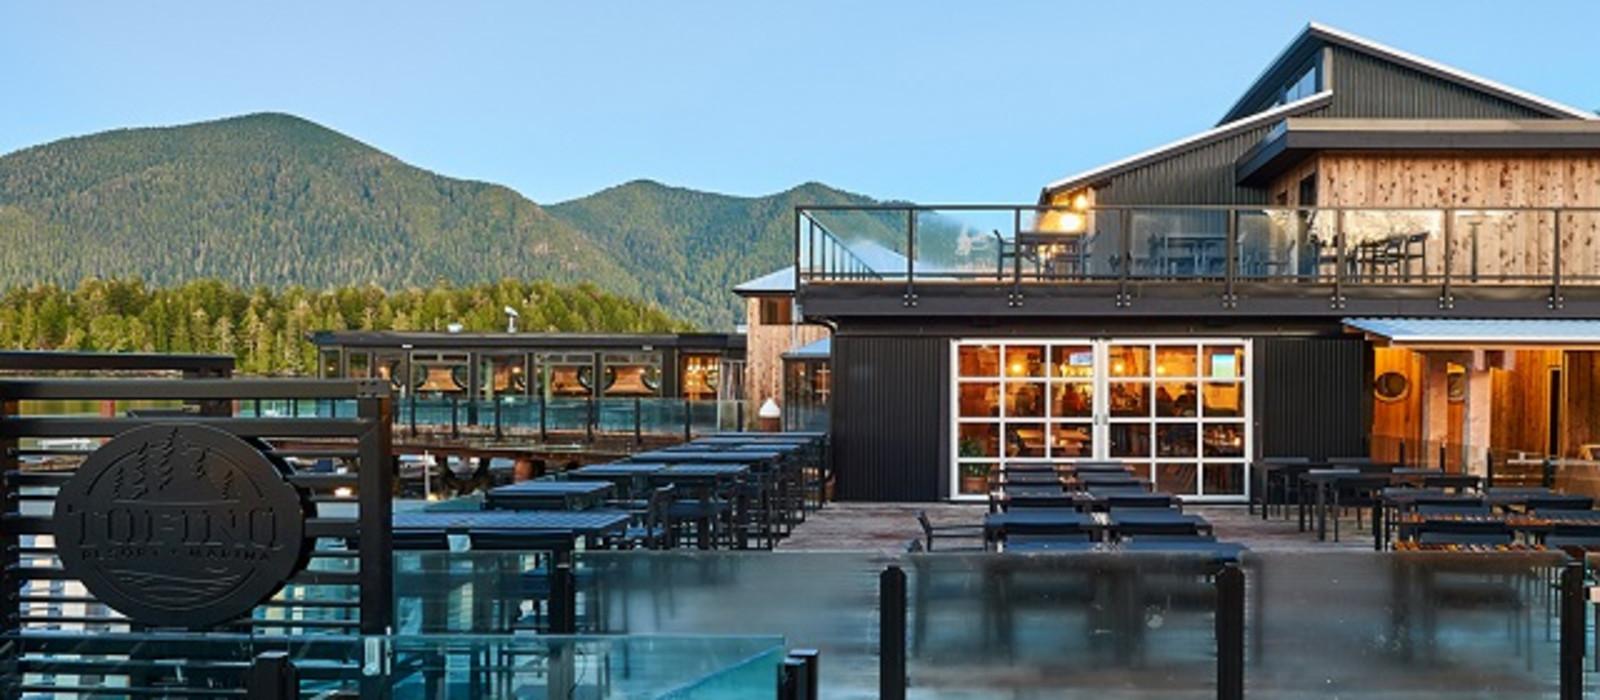 Hotel Tofino Resort and Marina Canada